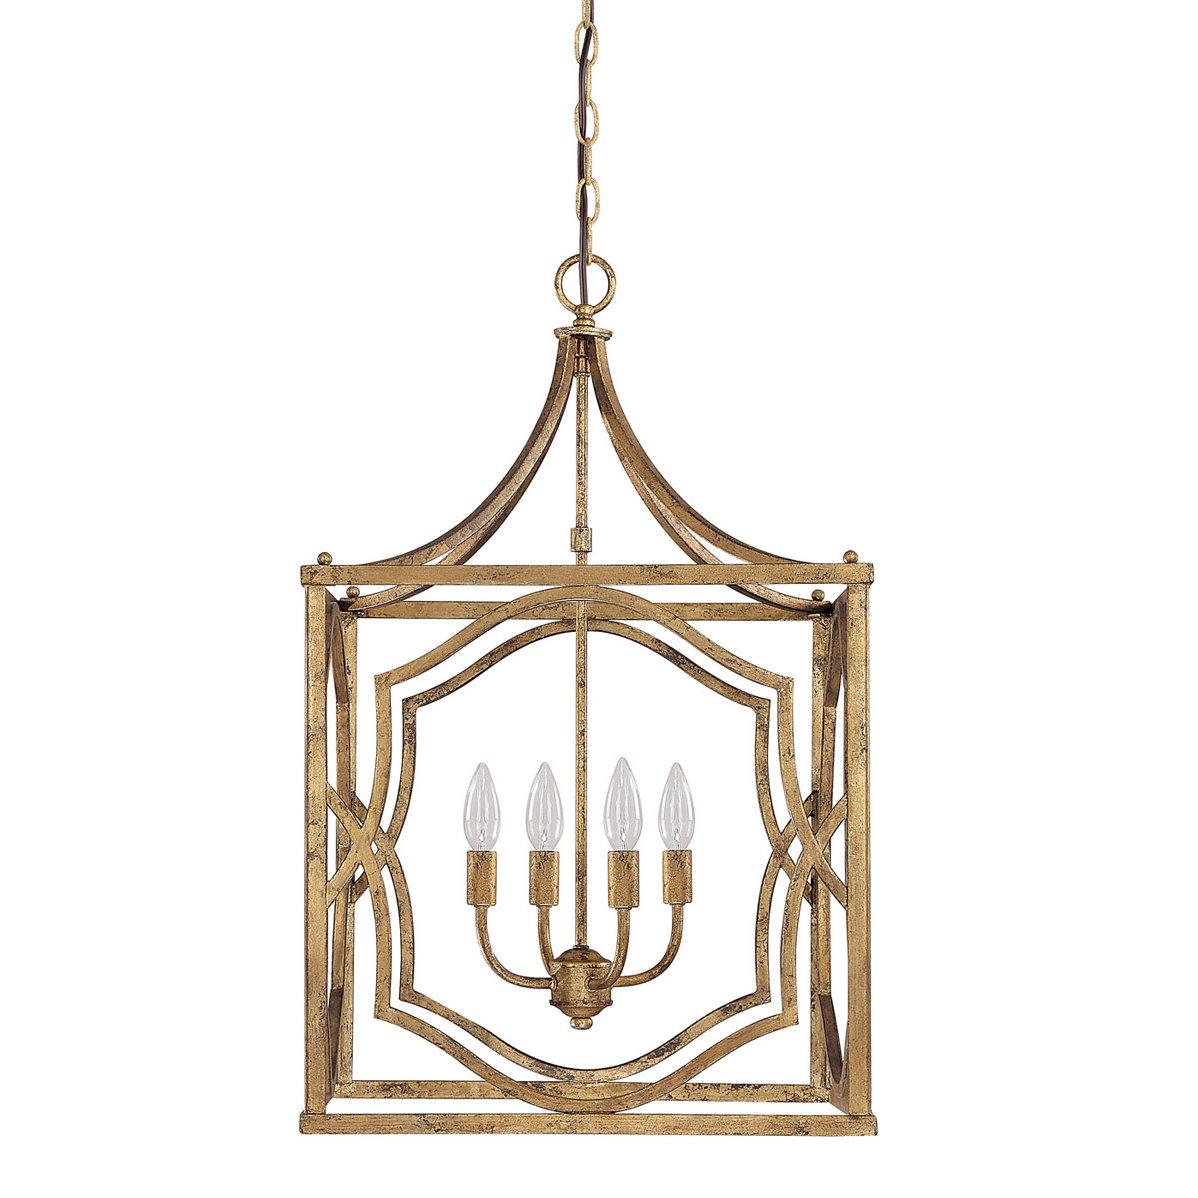 Destrey 4 Light Lantern Square / Rectangle Pendant With Regard To Taya 4 Light Lantern Square Pendants (Gallery 2 of 30)